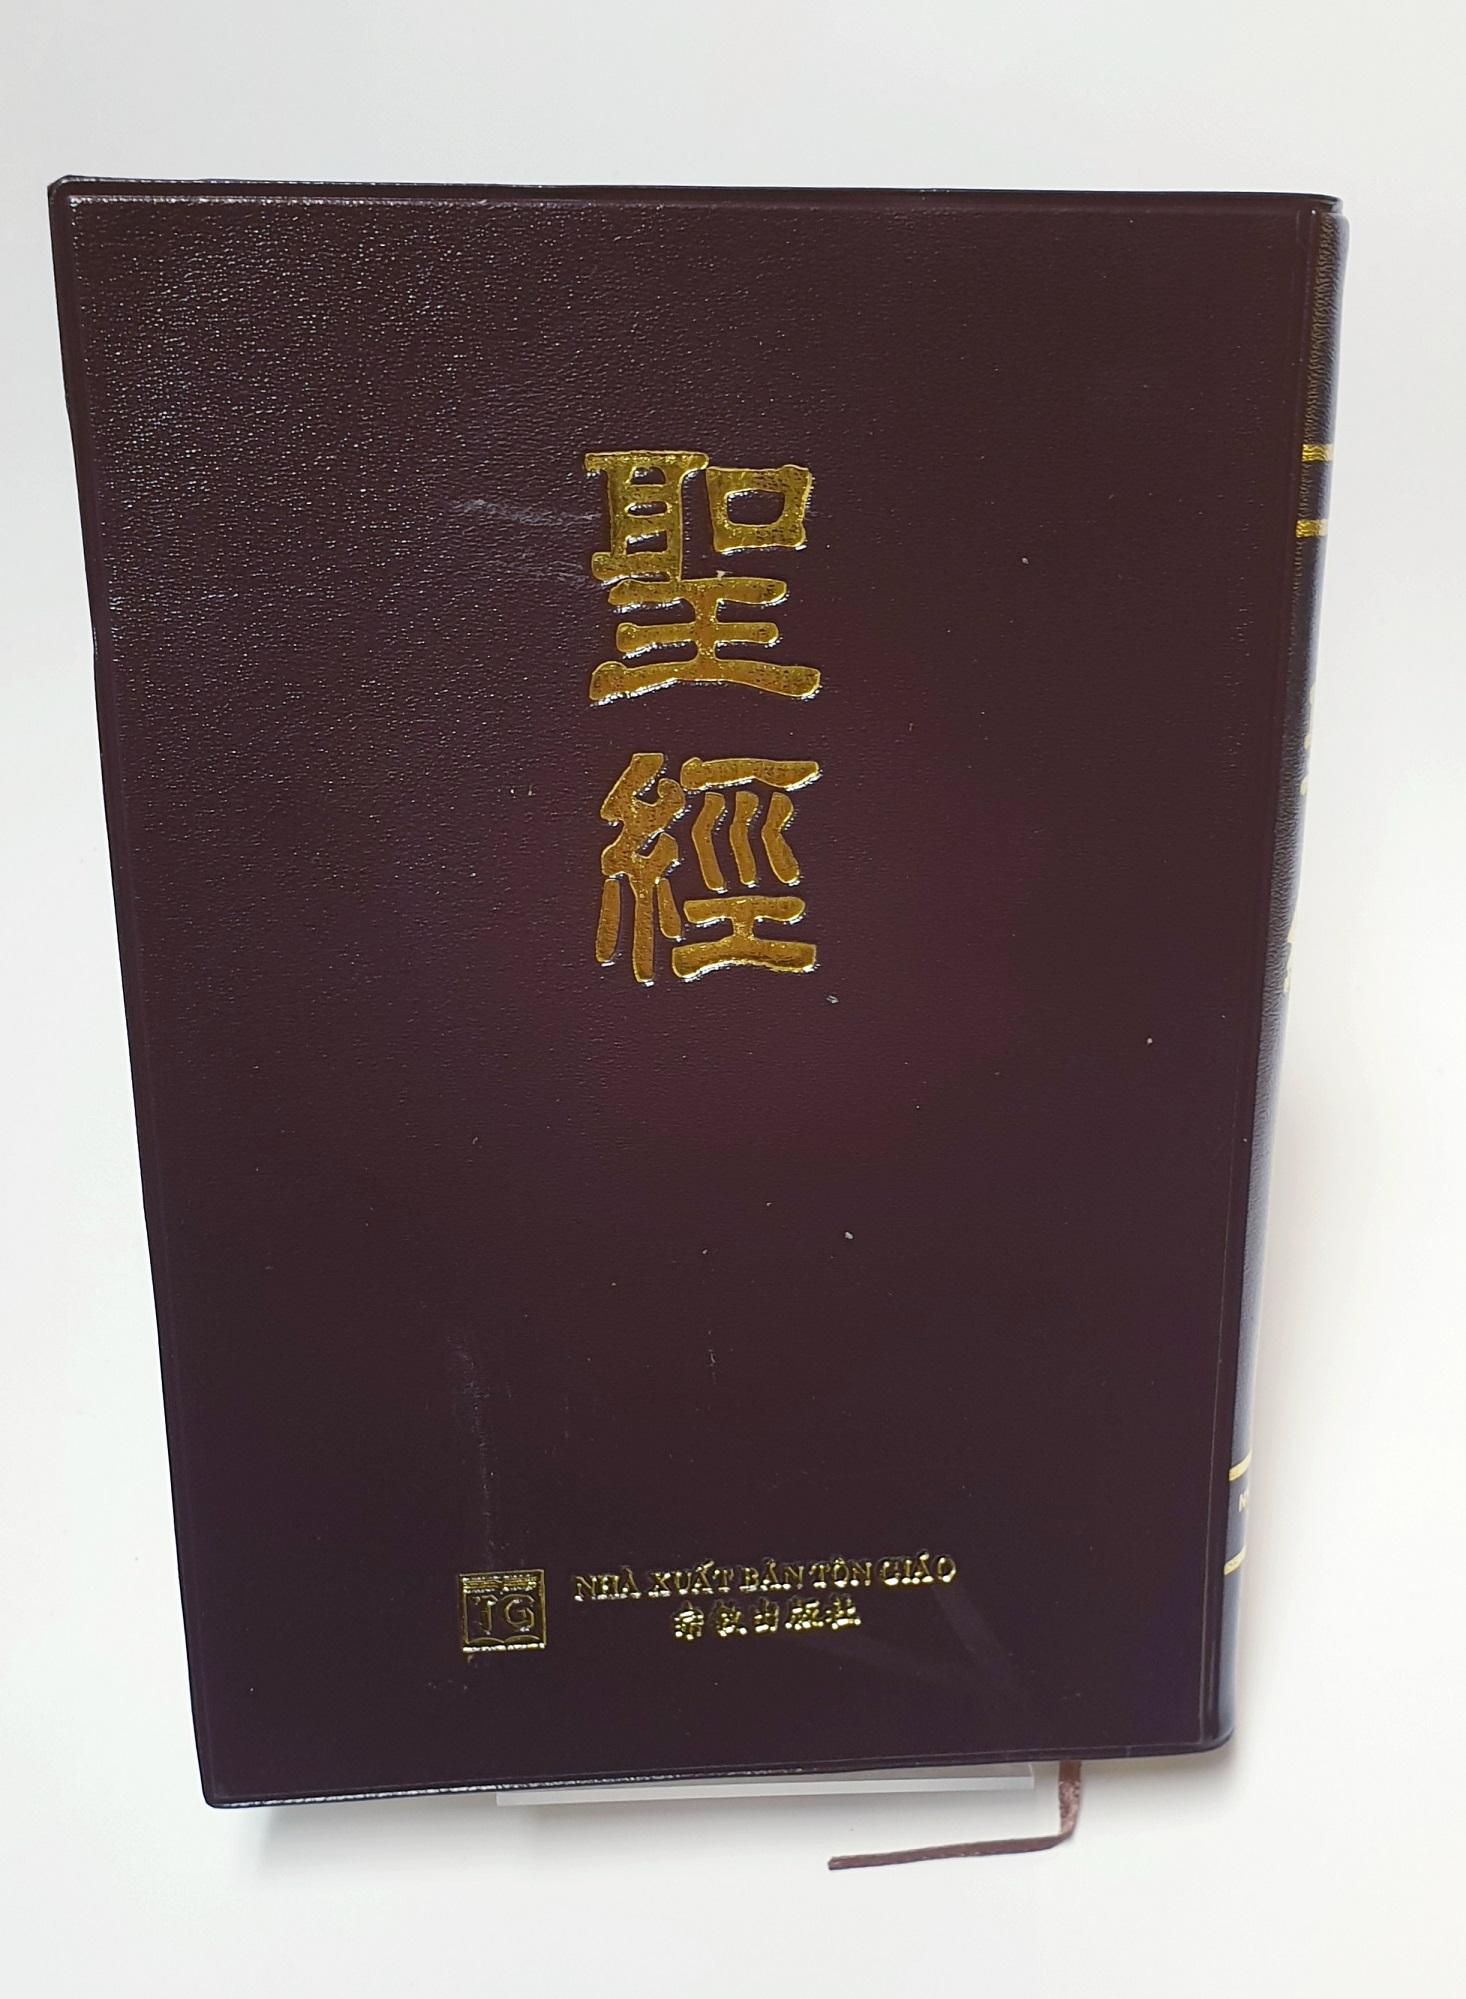 Kinesisk bibel shen artikelnummer 2498 via bibelbutiken.se